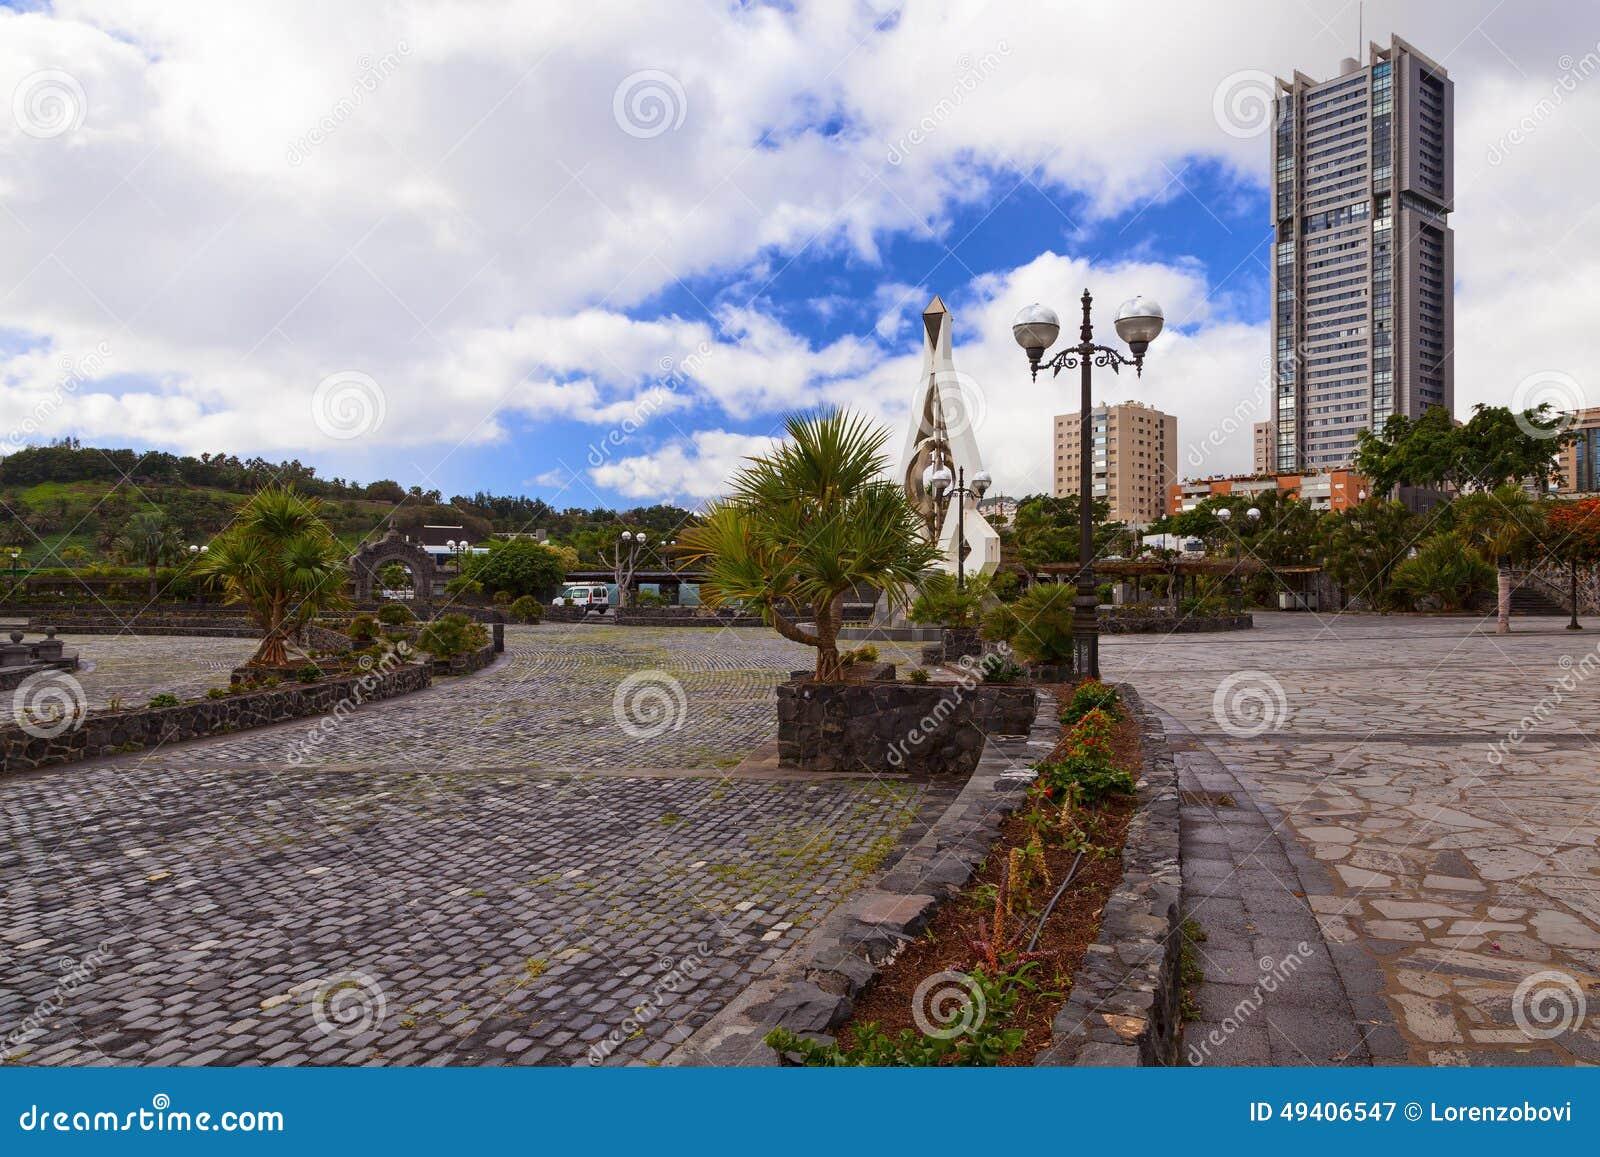 Download Santa- Cruzquadrat stockbild. Bild von sankt, asphalt - 49406547